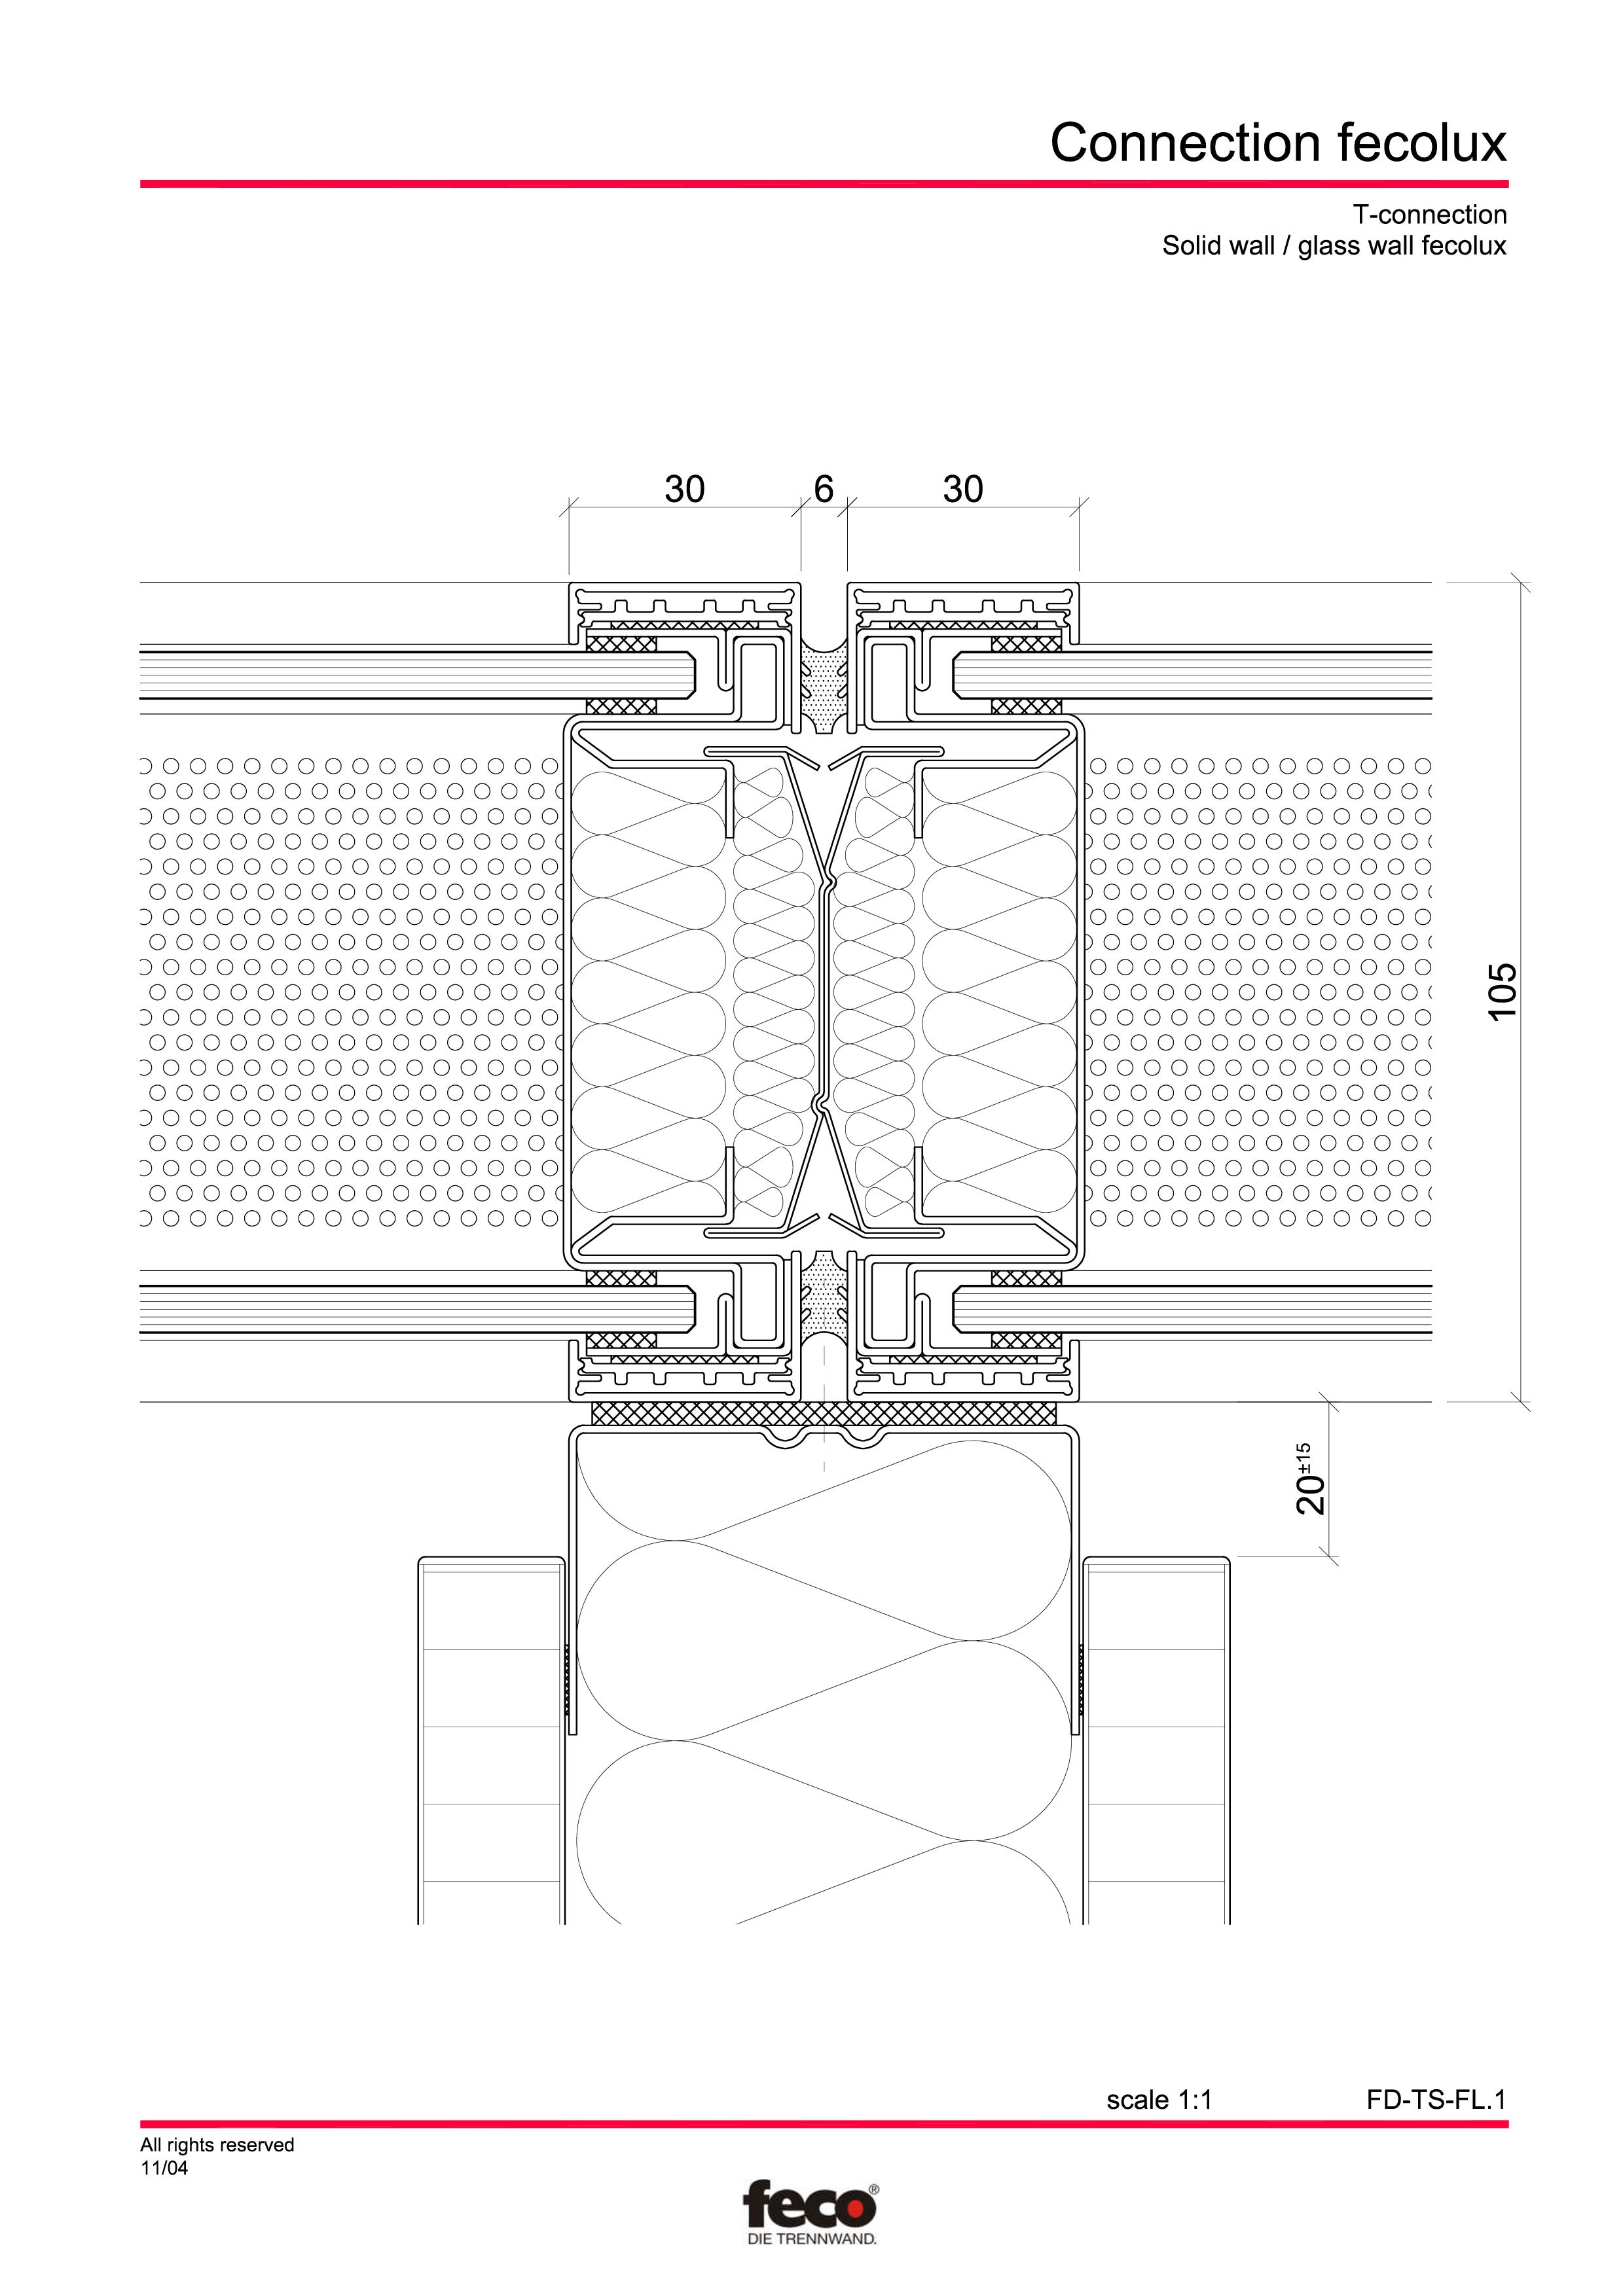 Pagina 8 - CAD-PDF Detaliu racord pereti FECO Detaliu de montaj FecoPur, FecoFix, FecoLux